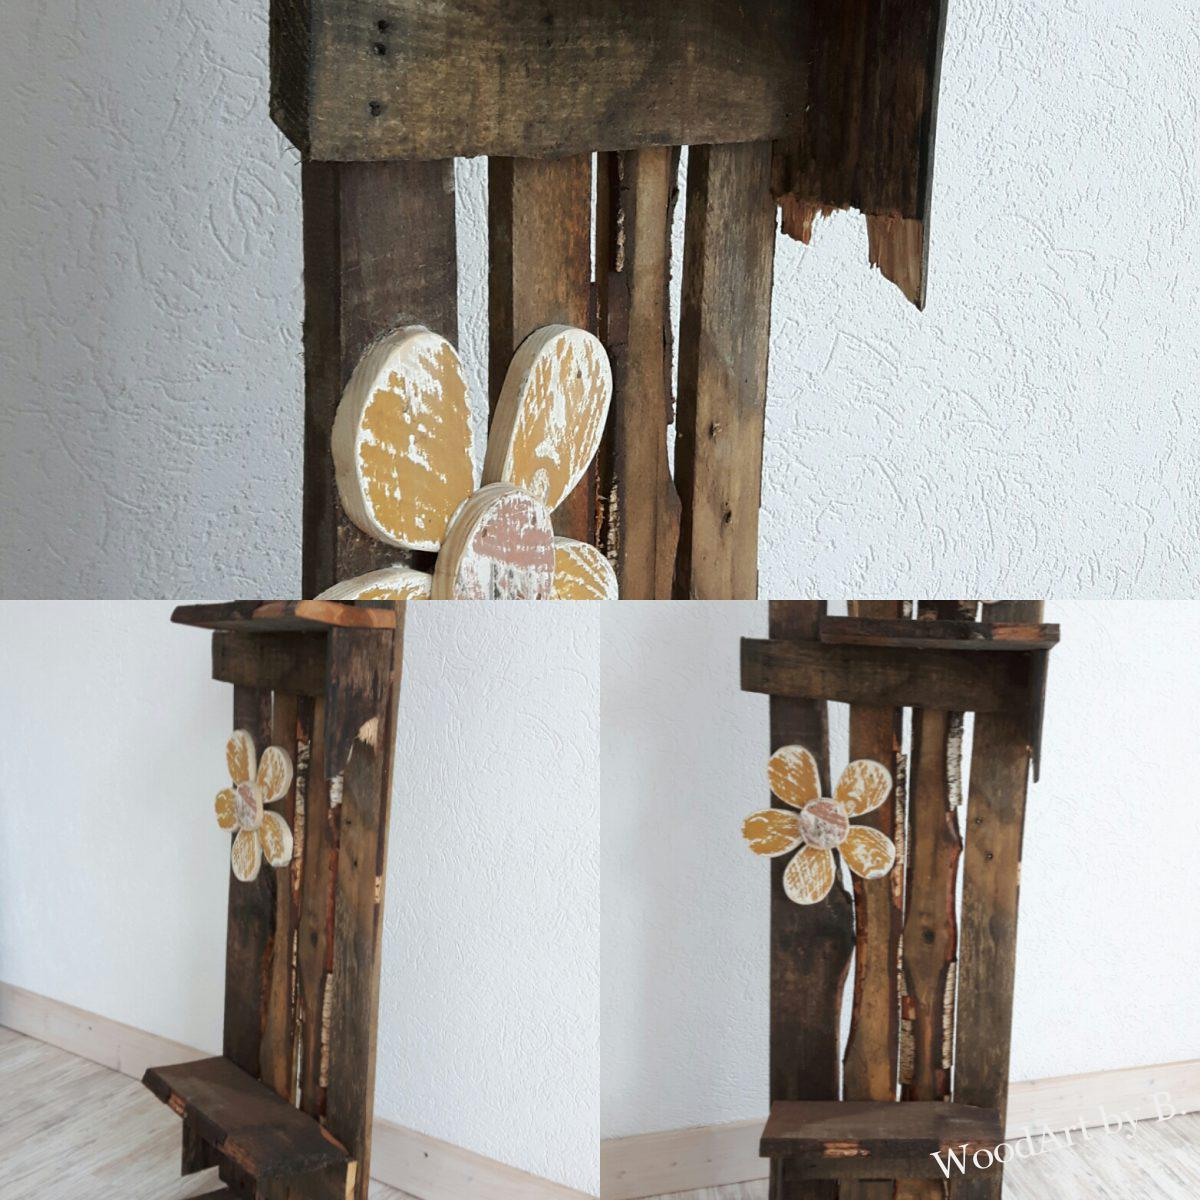 deko st nder aus alten brettern altholz woodart by b. Black Bedroom Furniture Sets. Home Design Ideas